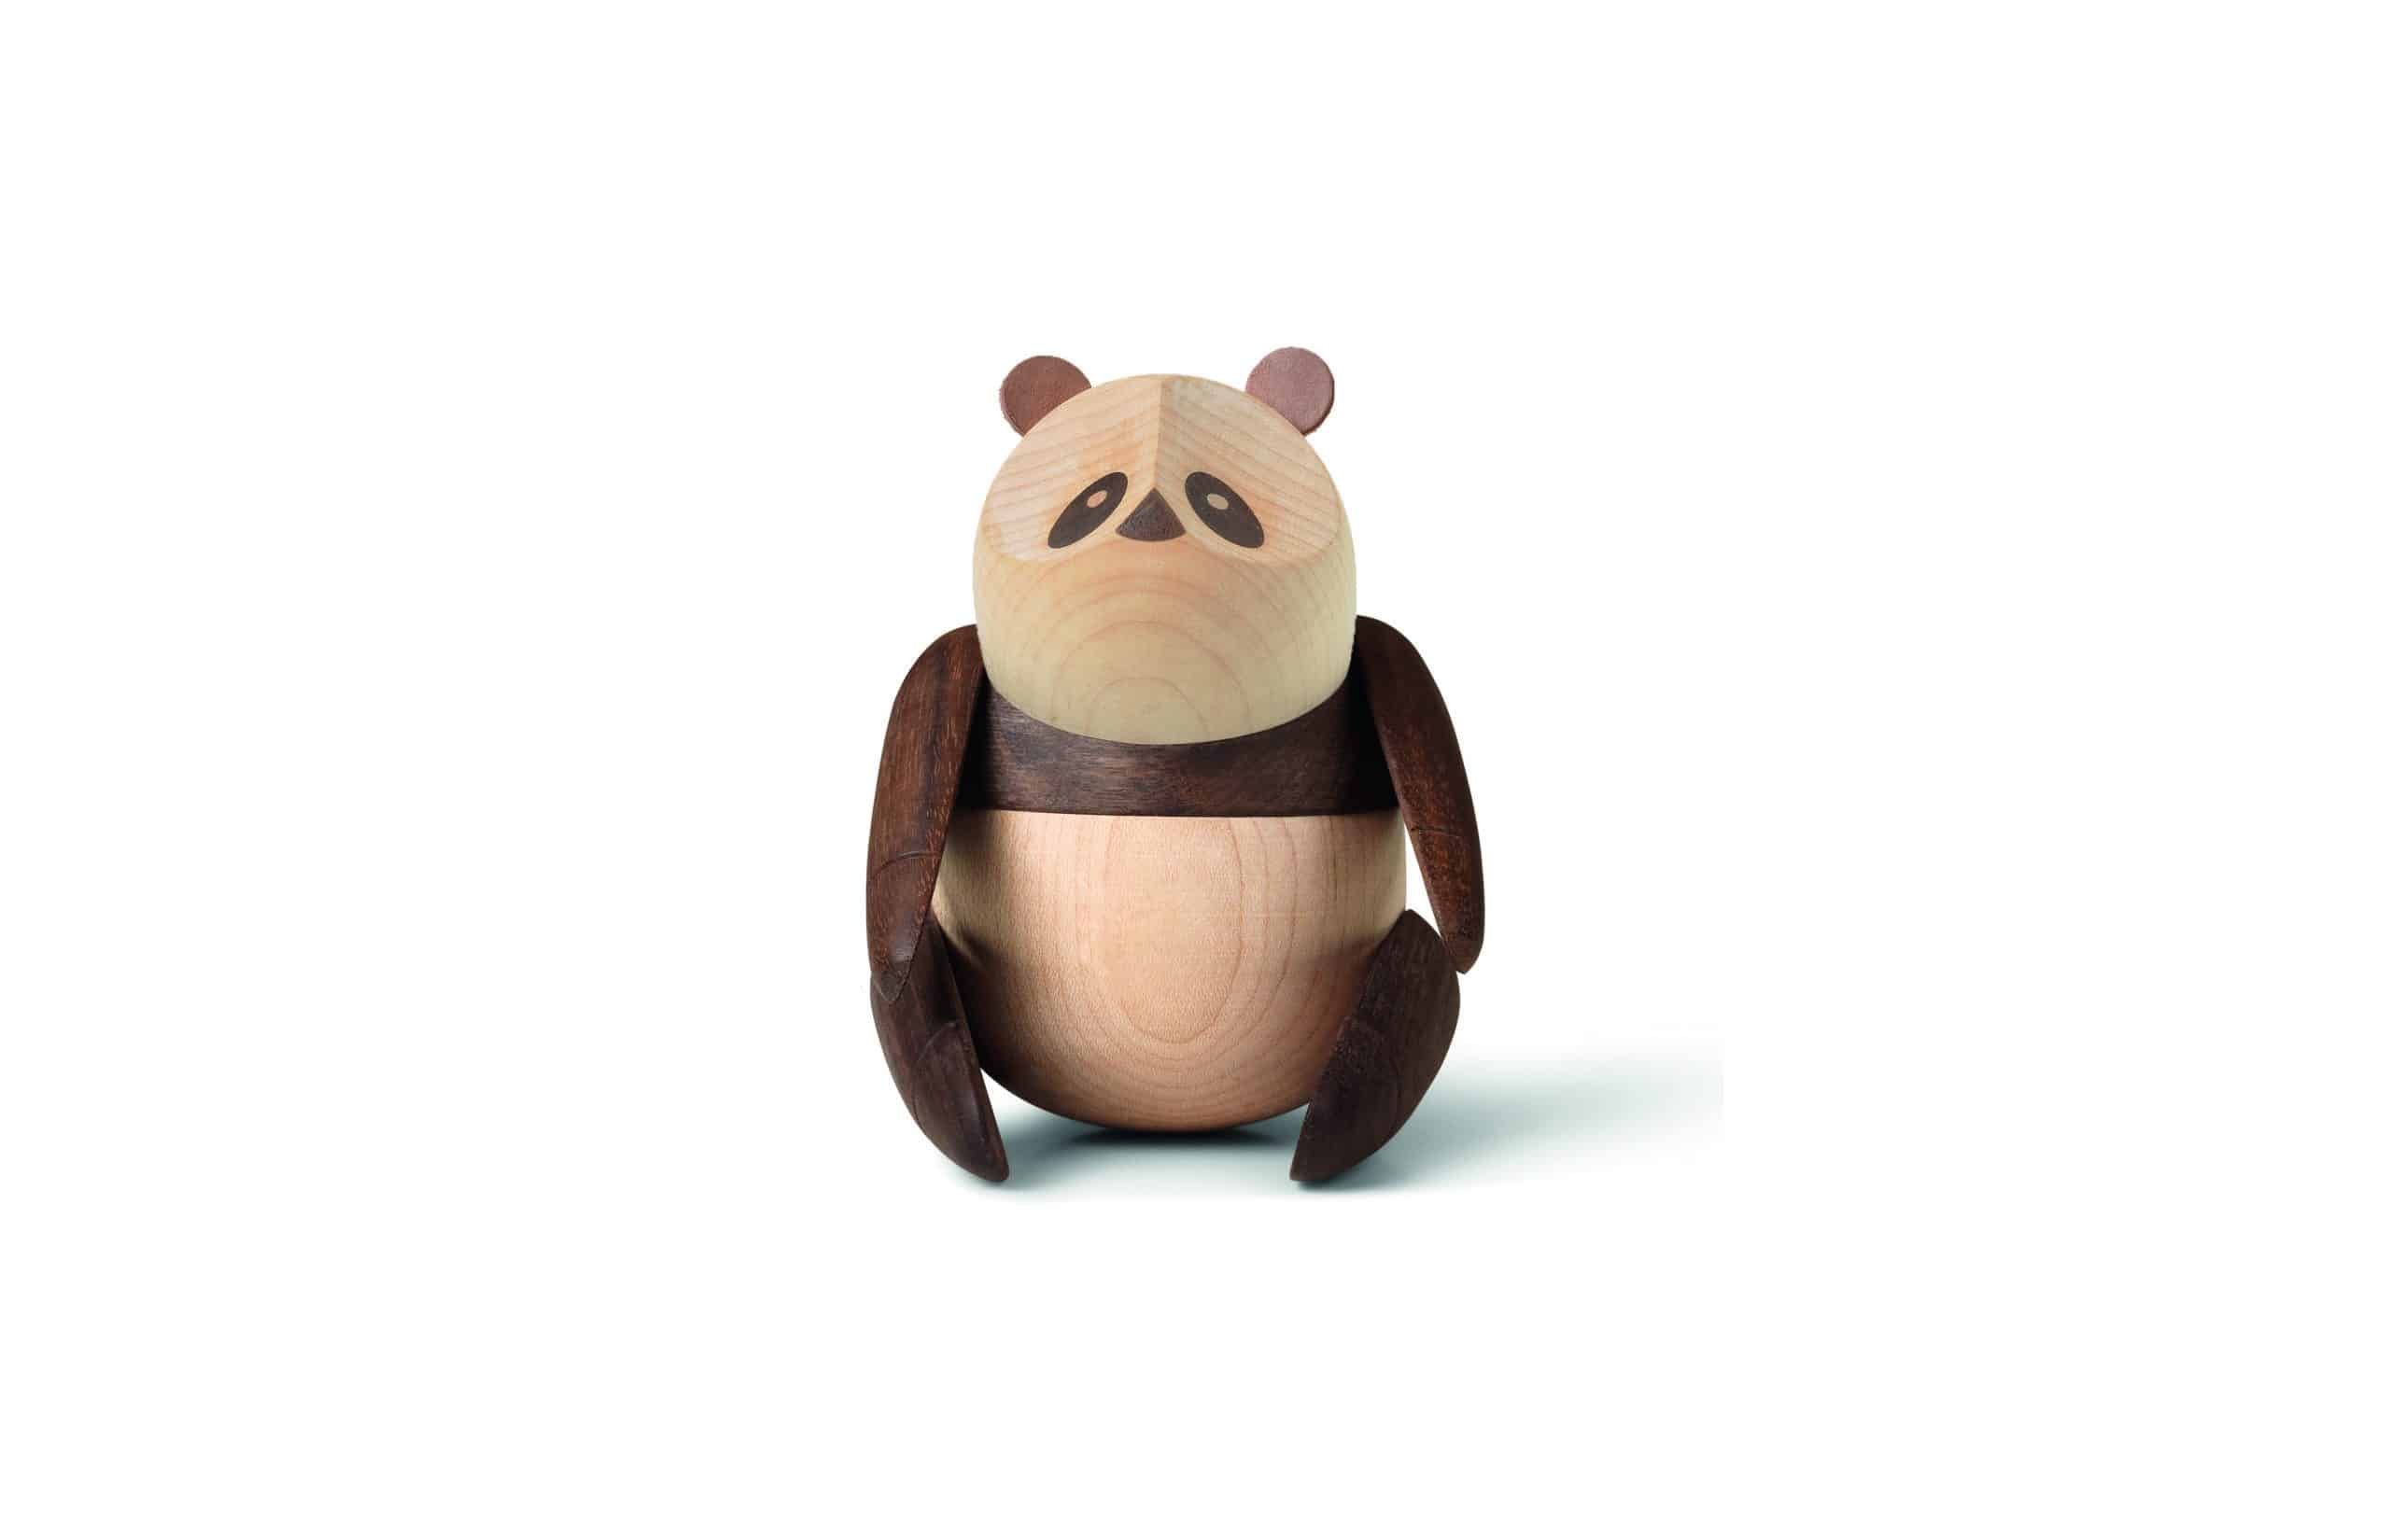 ARCHITECTMADE Panda Small Walnut Maple Bjarke Ingels